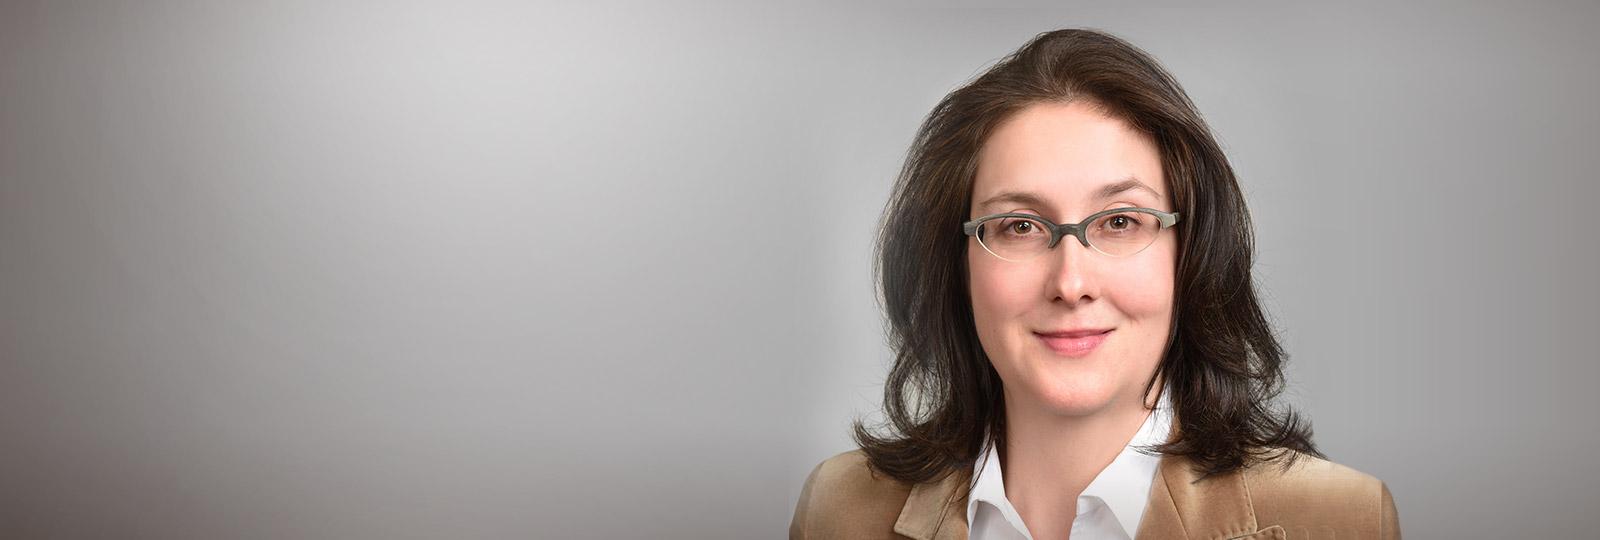 hautarzt-dr-andrea-niedermeier